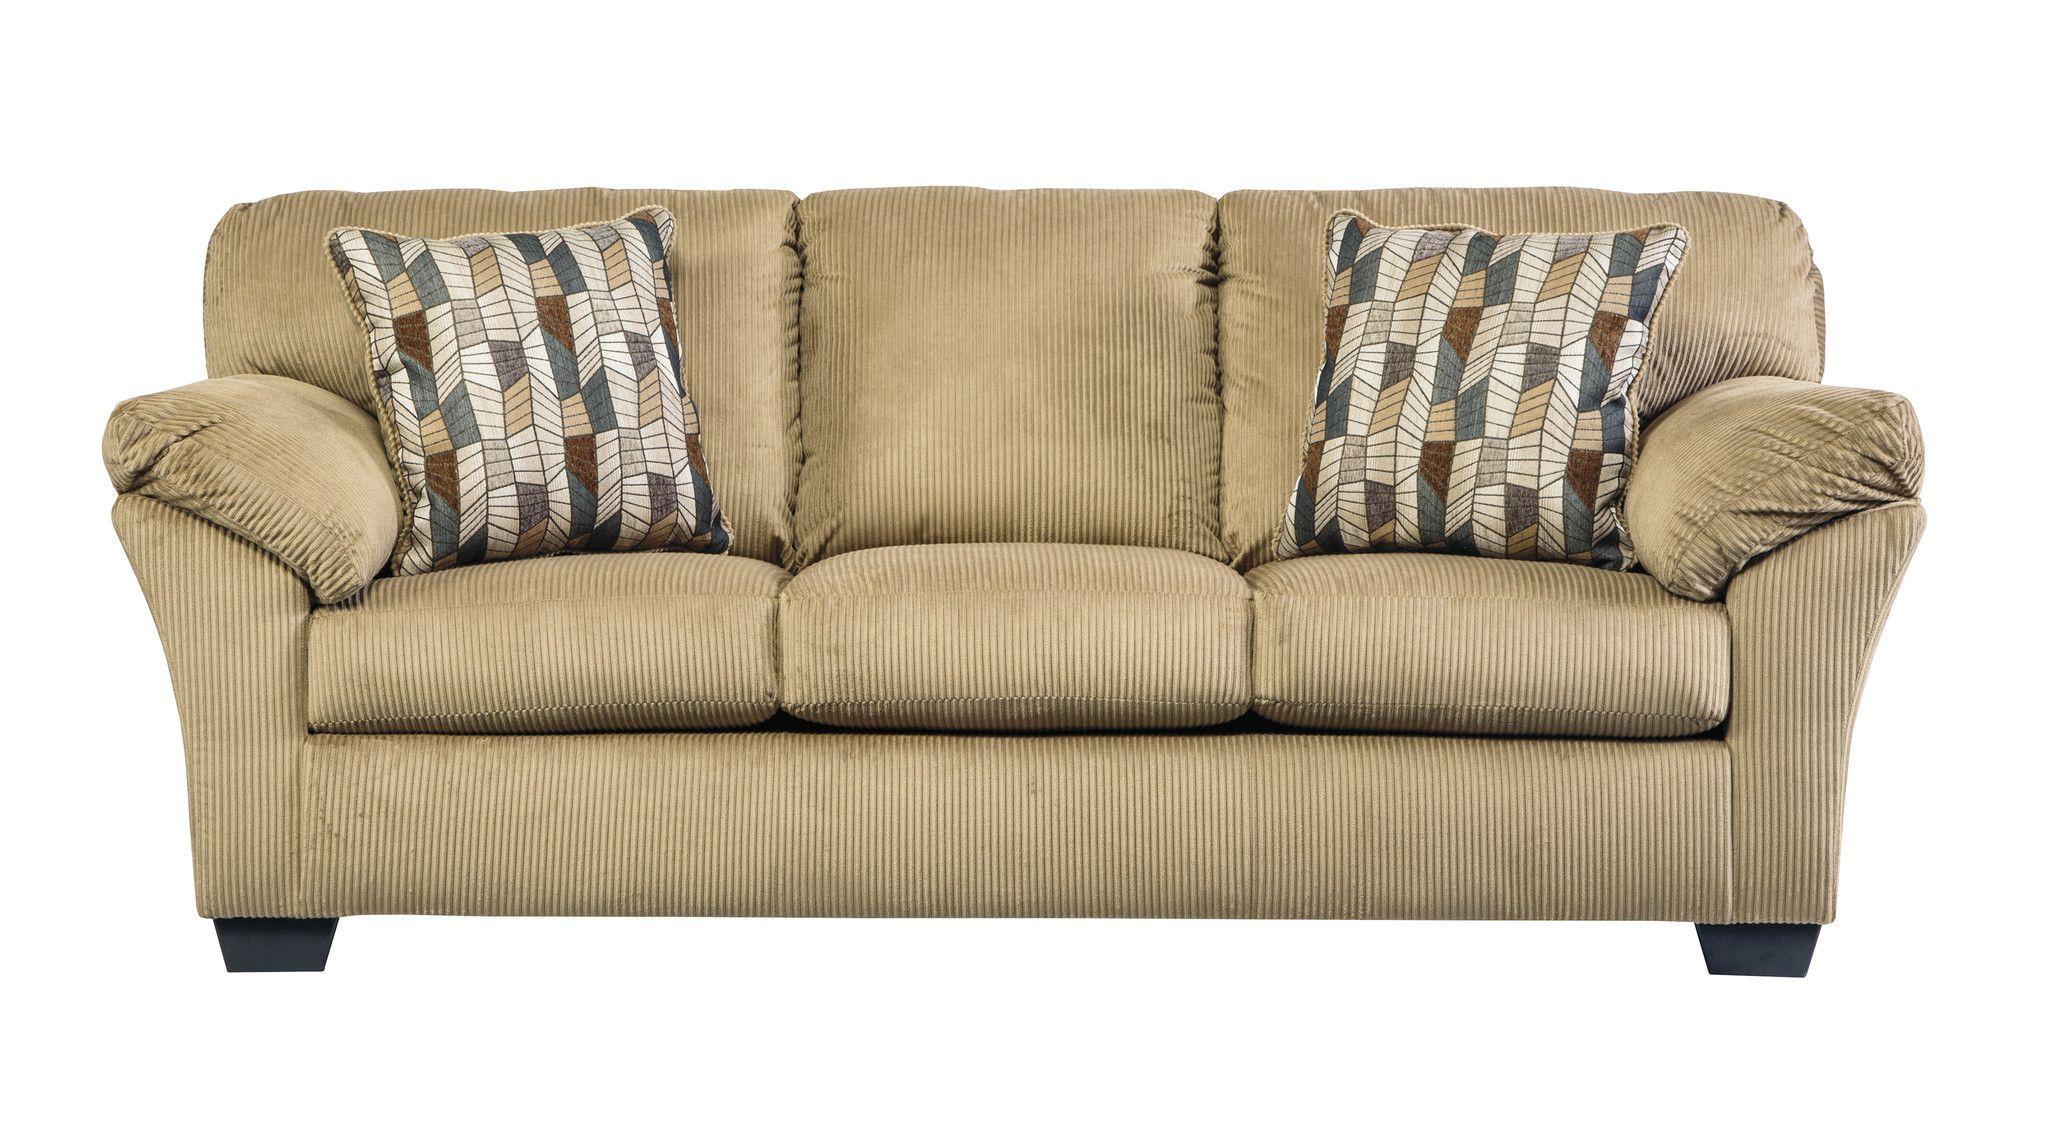 Aluria Sofa Retro Sofa Queen Size Sleeper Sofa Ashley Furniture Sofas